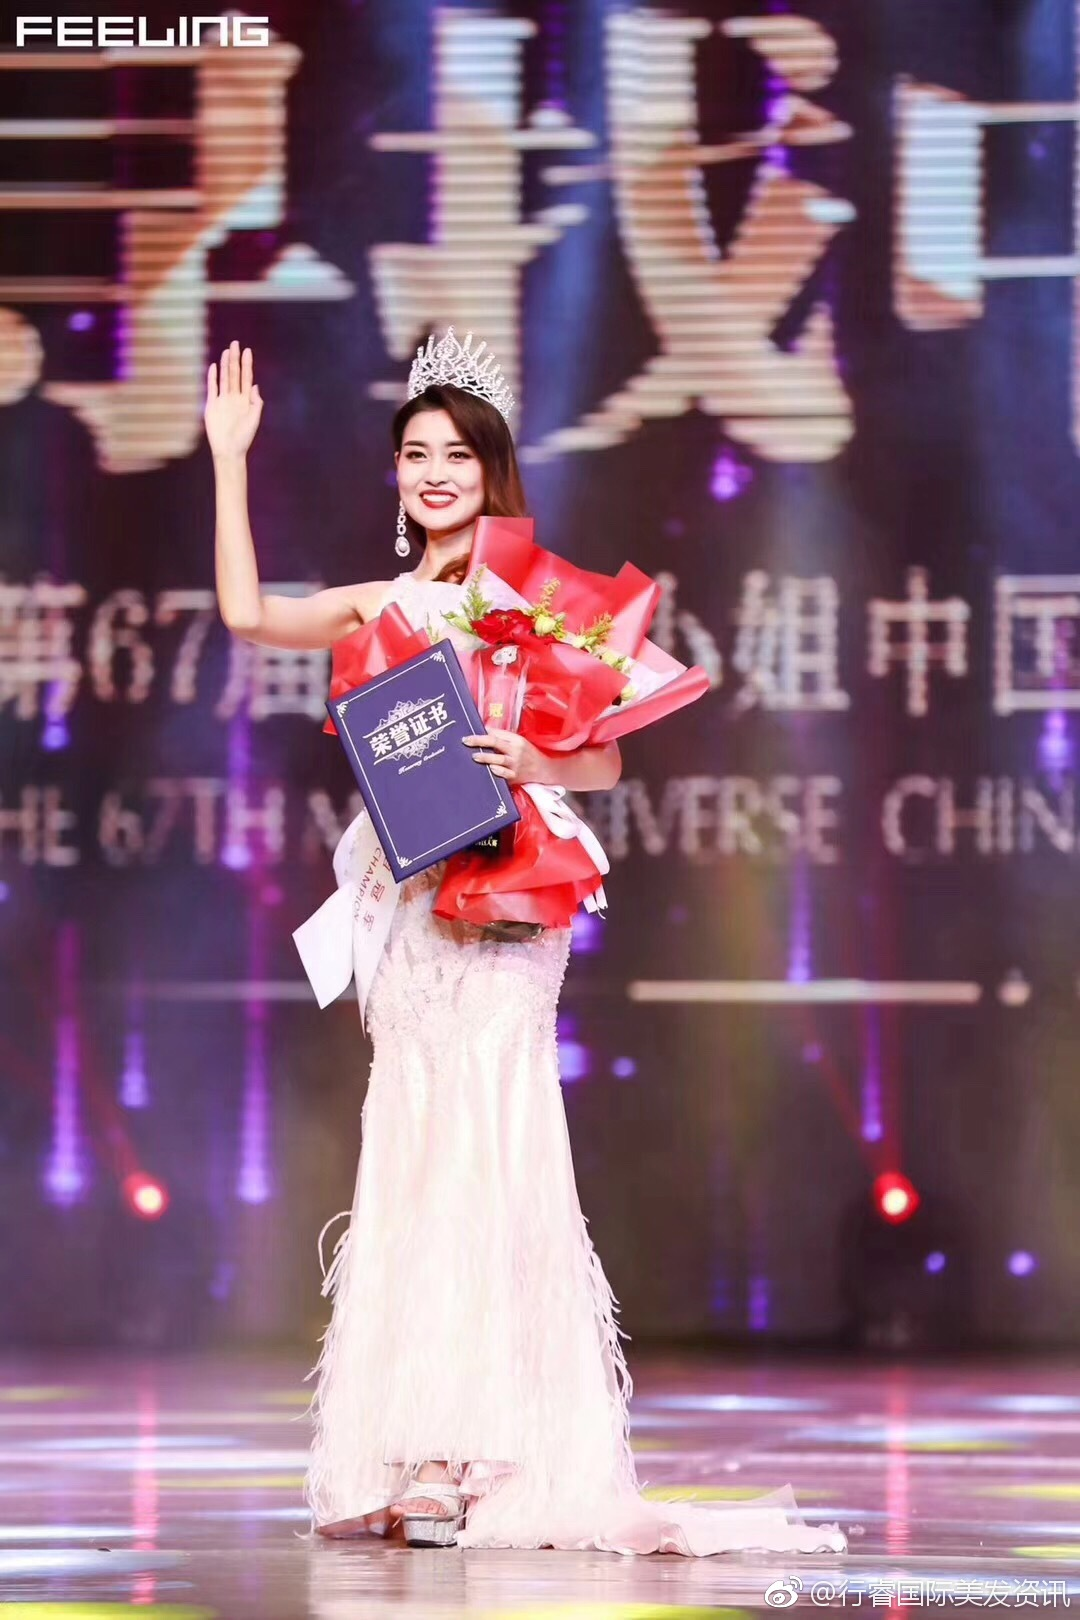 zhu xin, miss china universo 2019. 794c52ably1fz6lw1qikqj20u01907bo